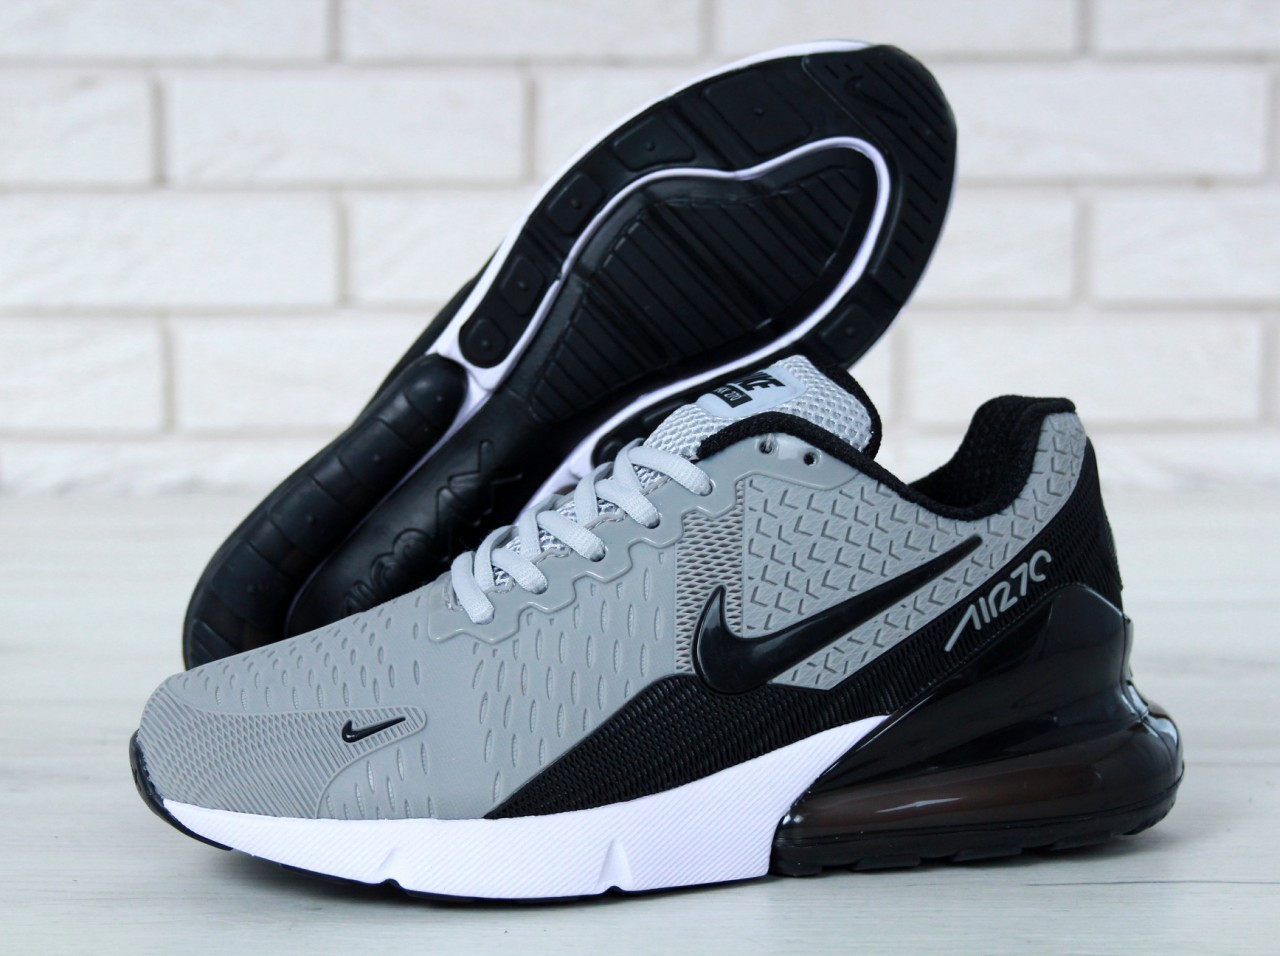 e4782188 Кроссовки мужские Nike Air Max Flair 270 KPU Grey, цена 1 786,66 грн.,  купить в Киеве — Prom.ua (ID#586226078)